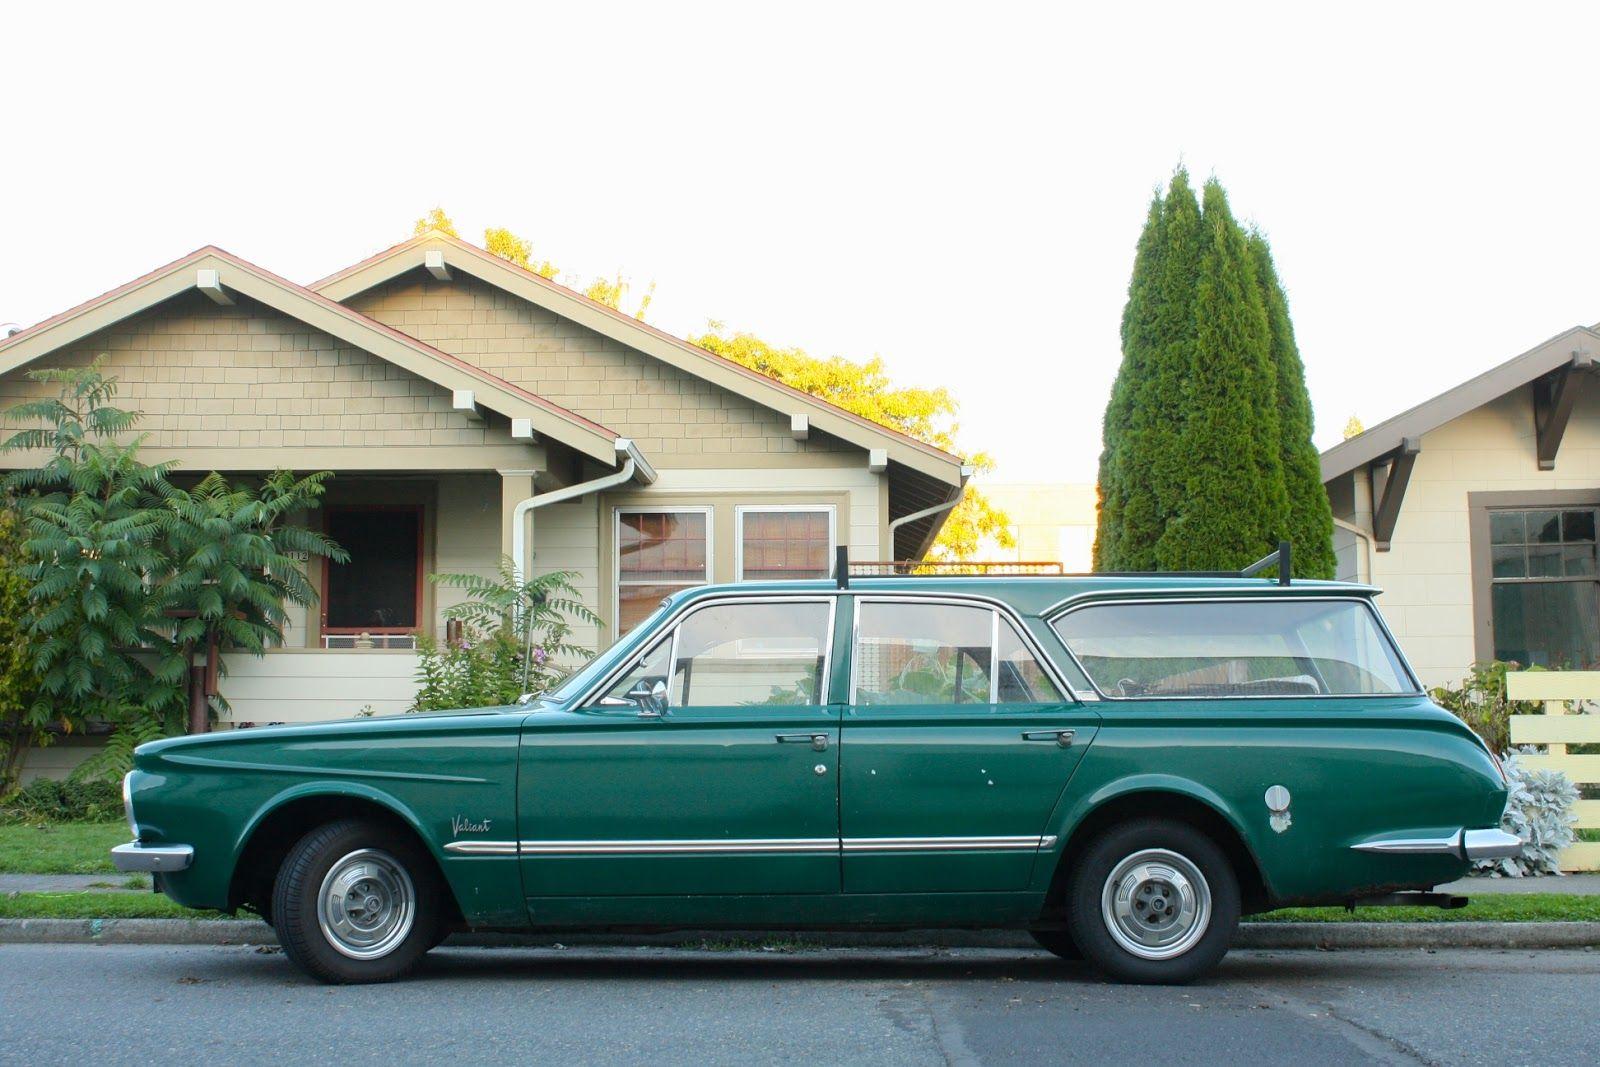 1964 plymouth valiant station wagon